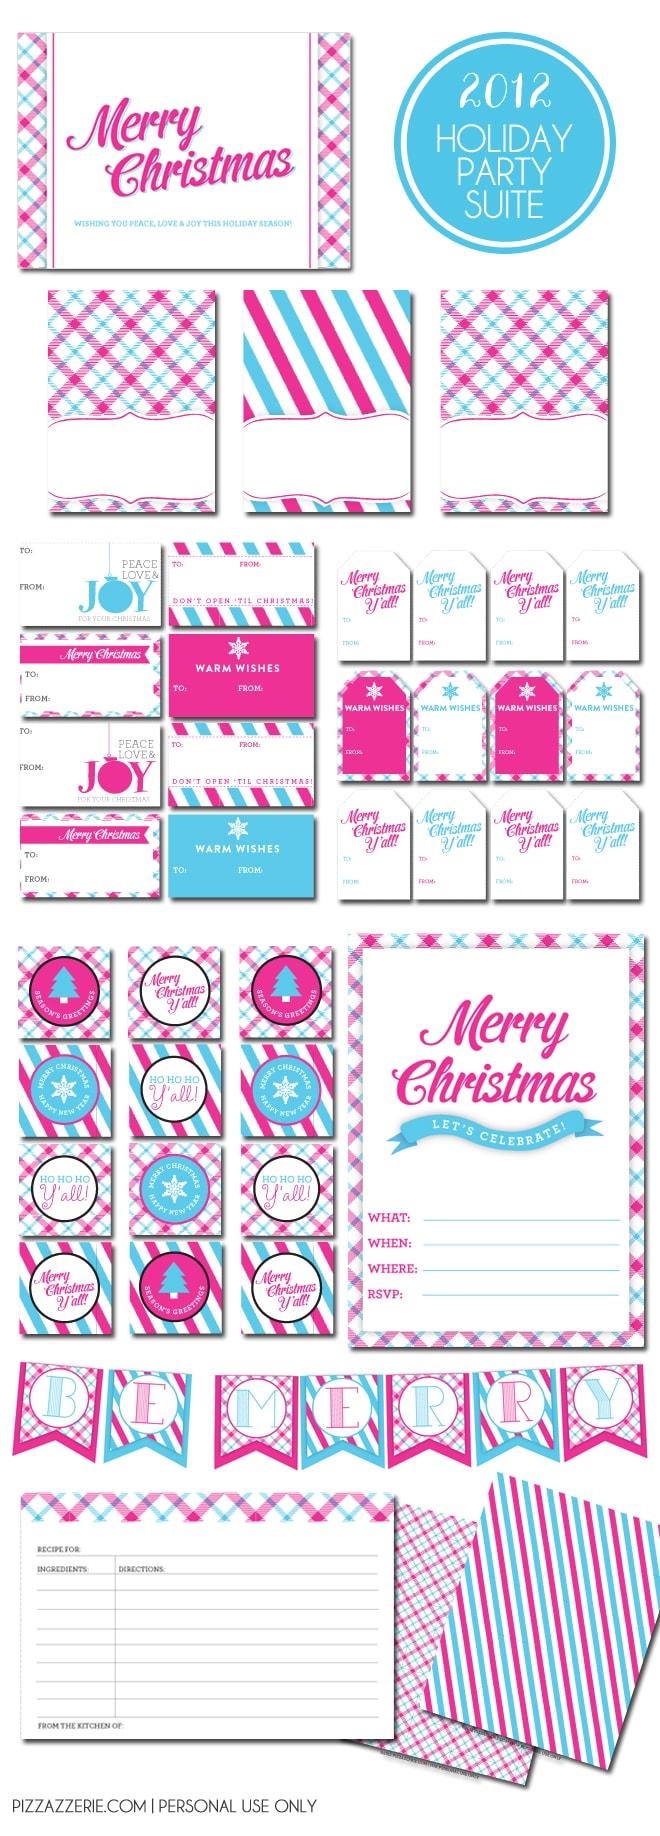 Free Holiday Printable Suite in Modern Pink & Aqua!